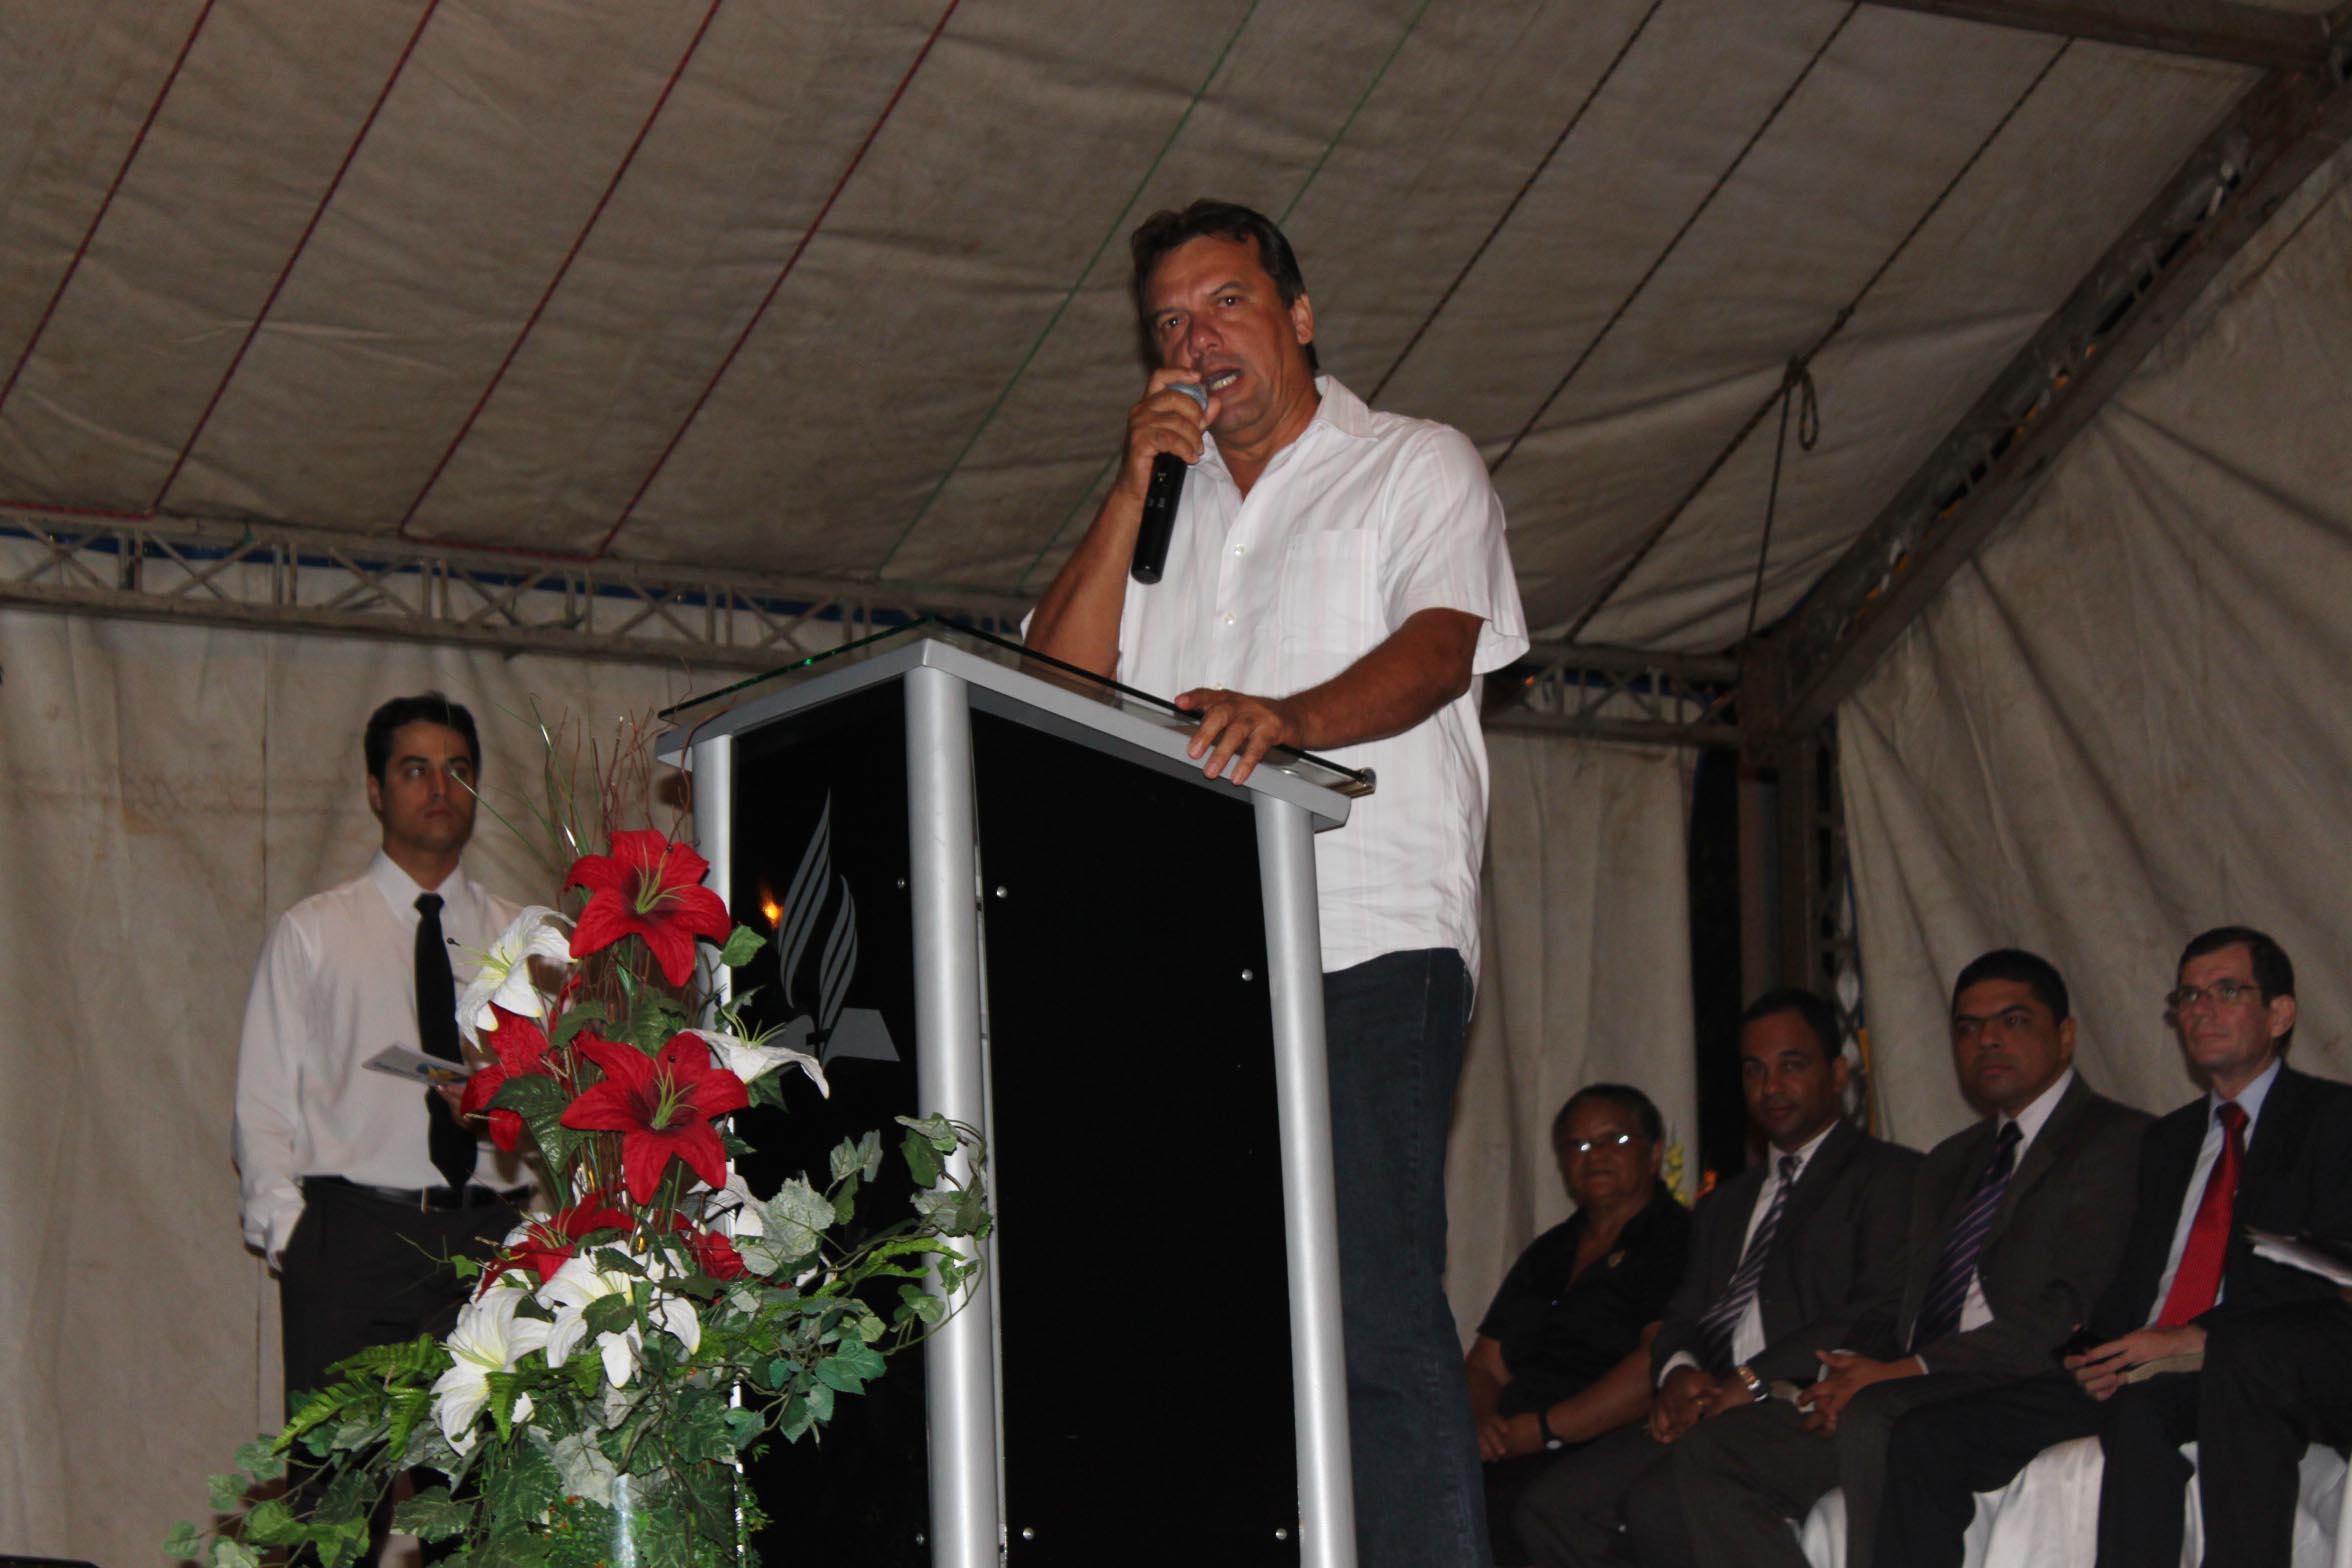 Prefeito da cidade, Fabion Souza, declarou: